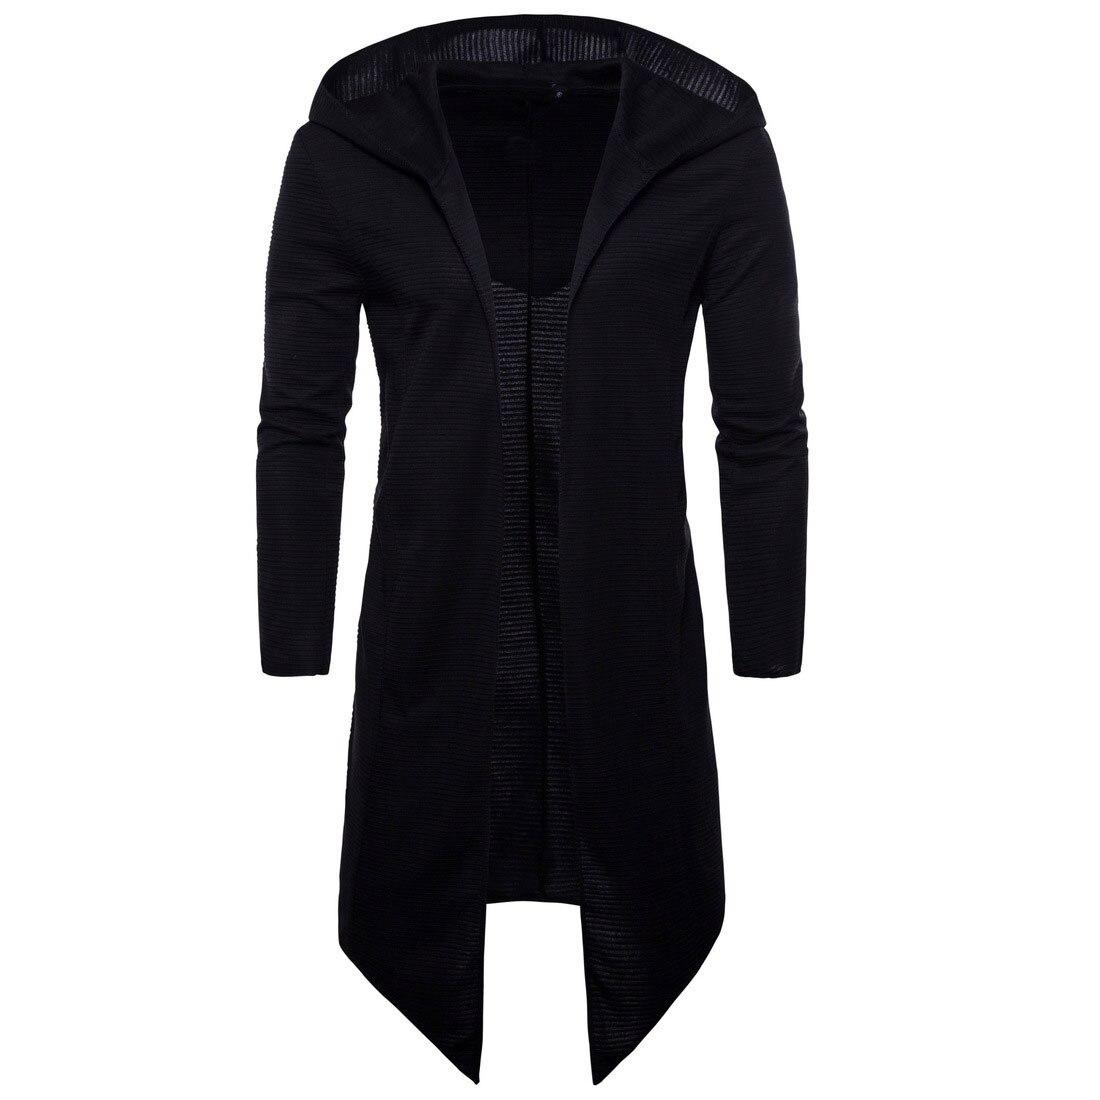 Для мужчин Тренч Весенняя мода длинный покрой Тренч Для мужчин пальто